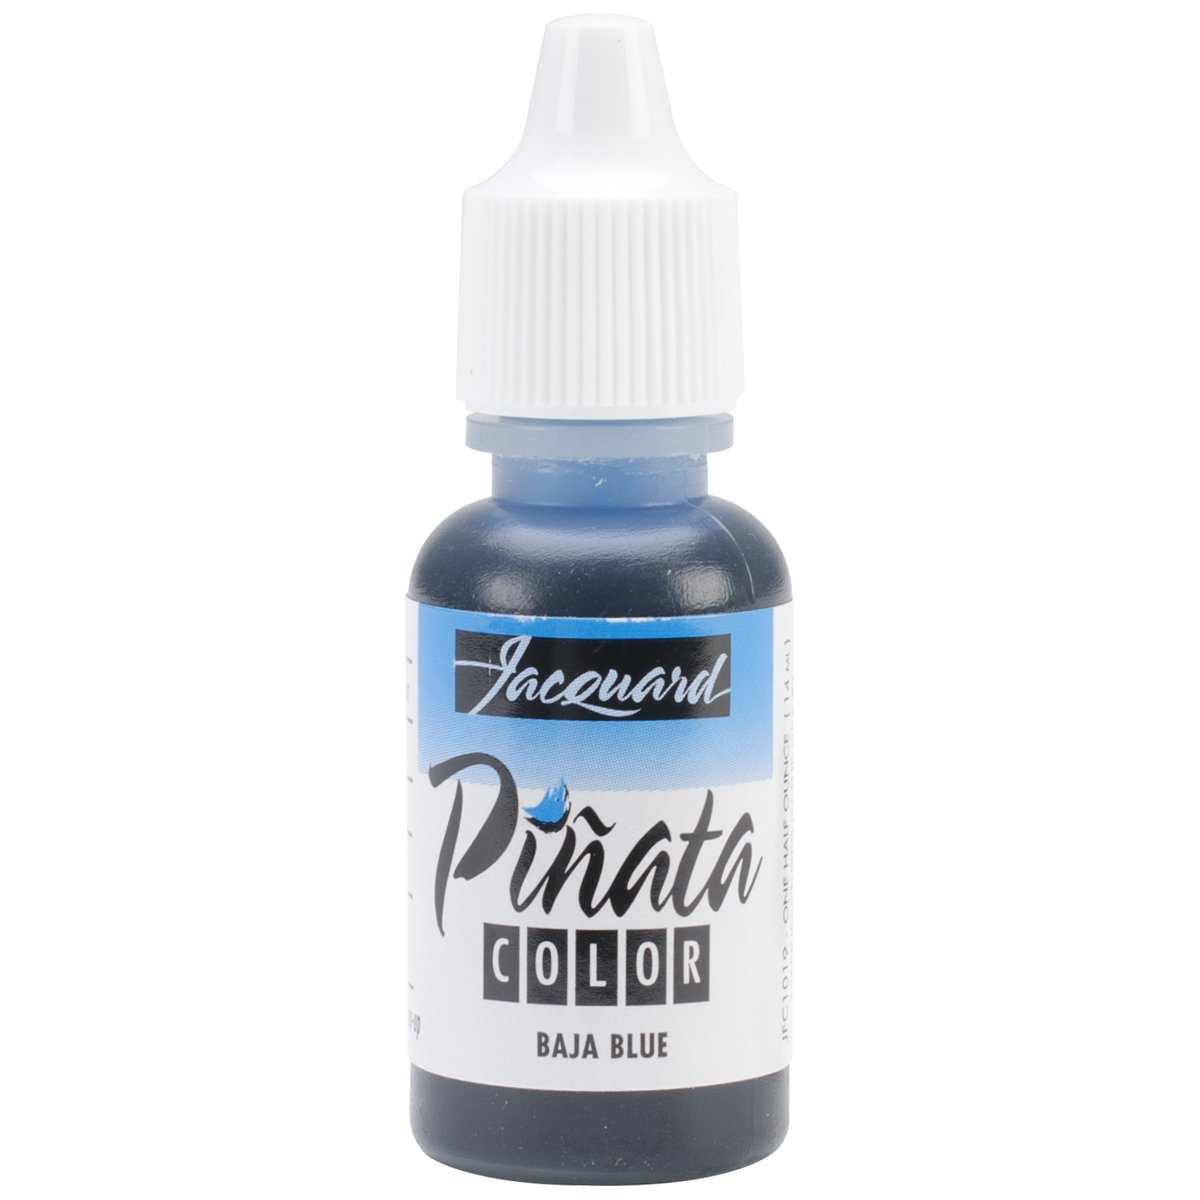 Jacquard Pinata tinta de alcohol - Baja Blue